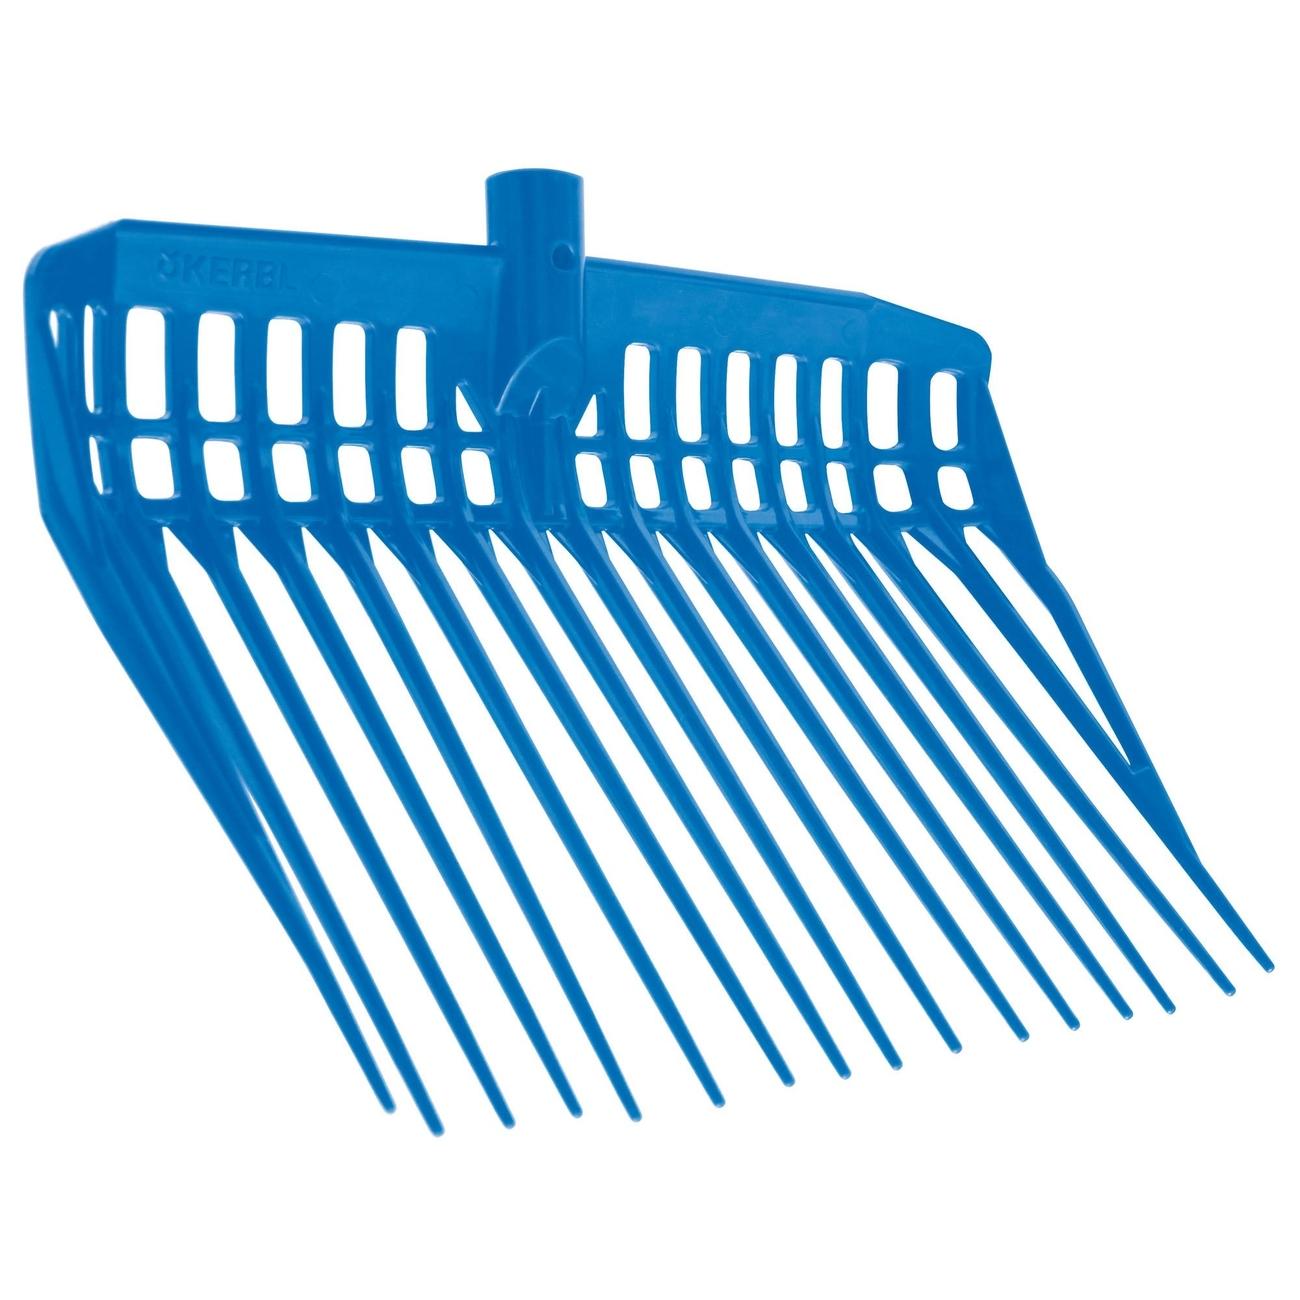 Kerbl EcoFork Mistgabel, blau, ohne Stiel